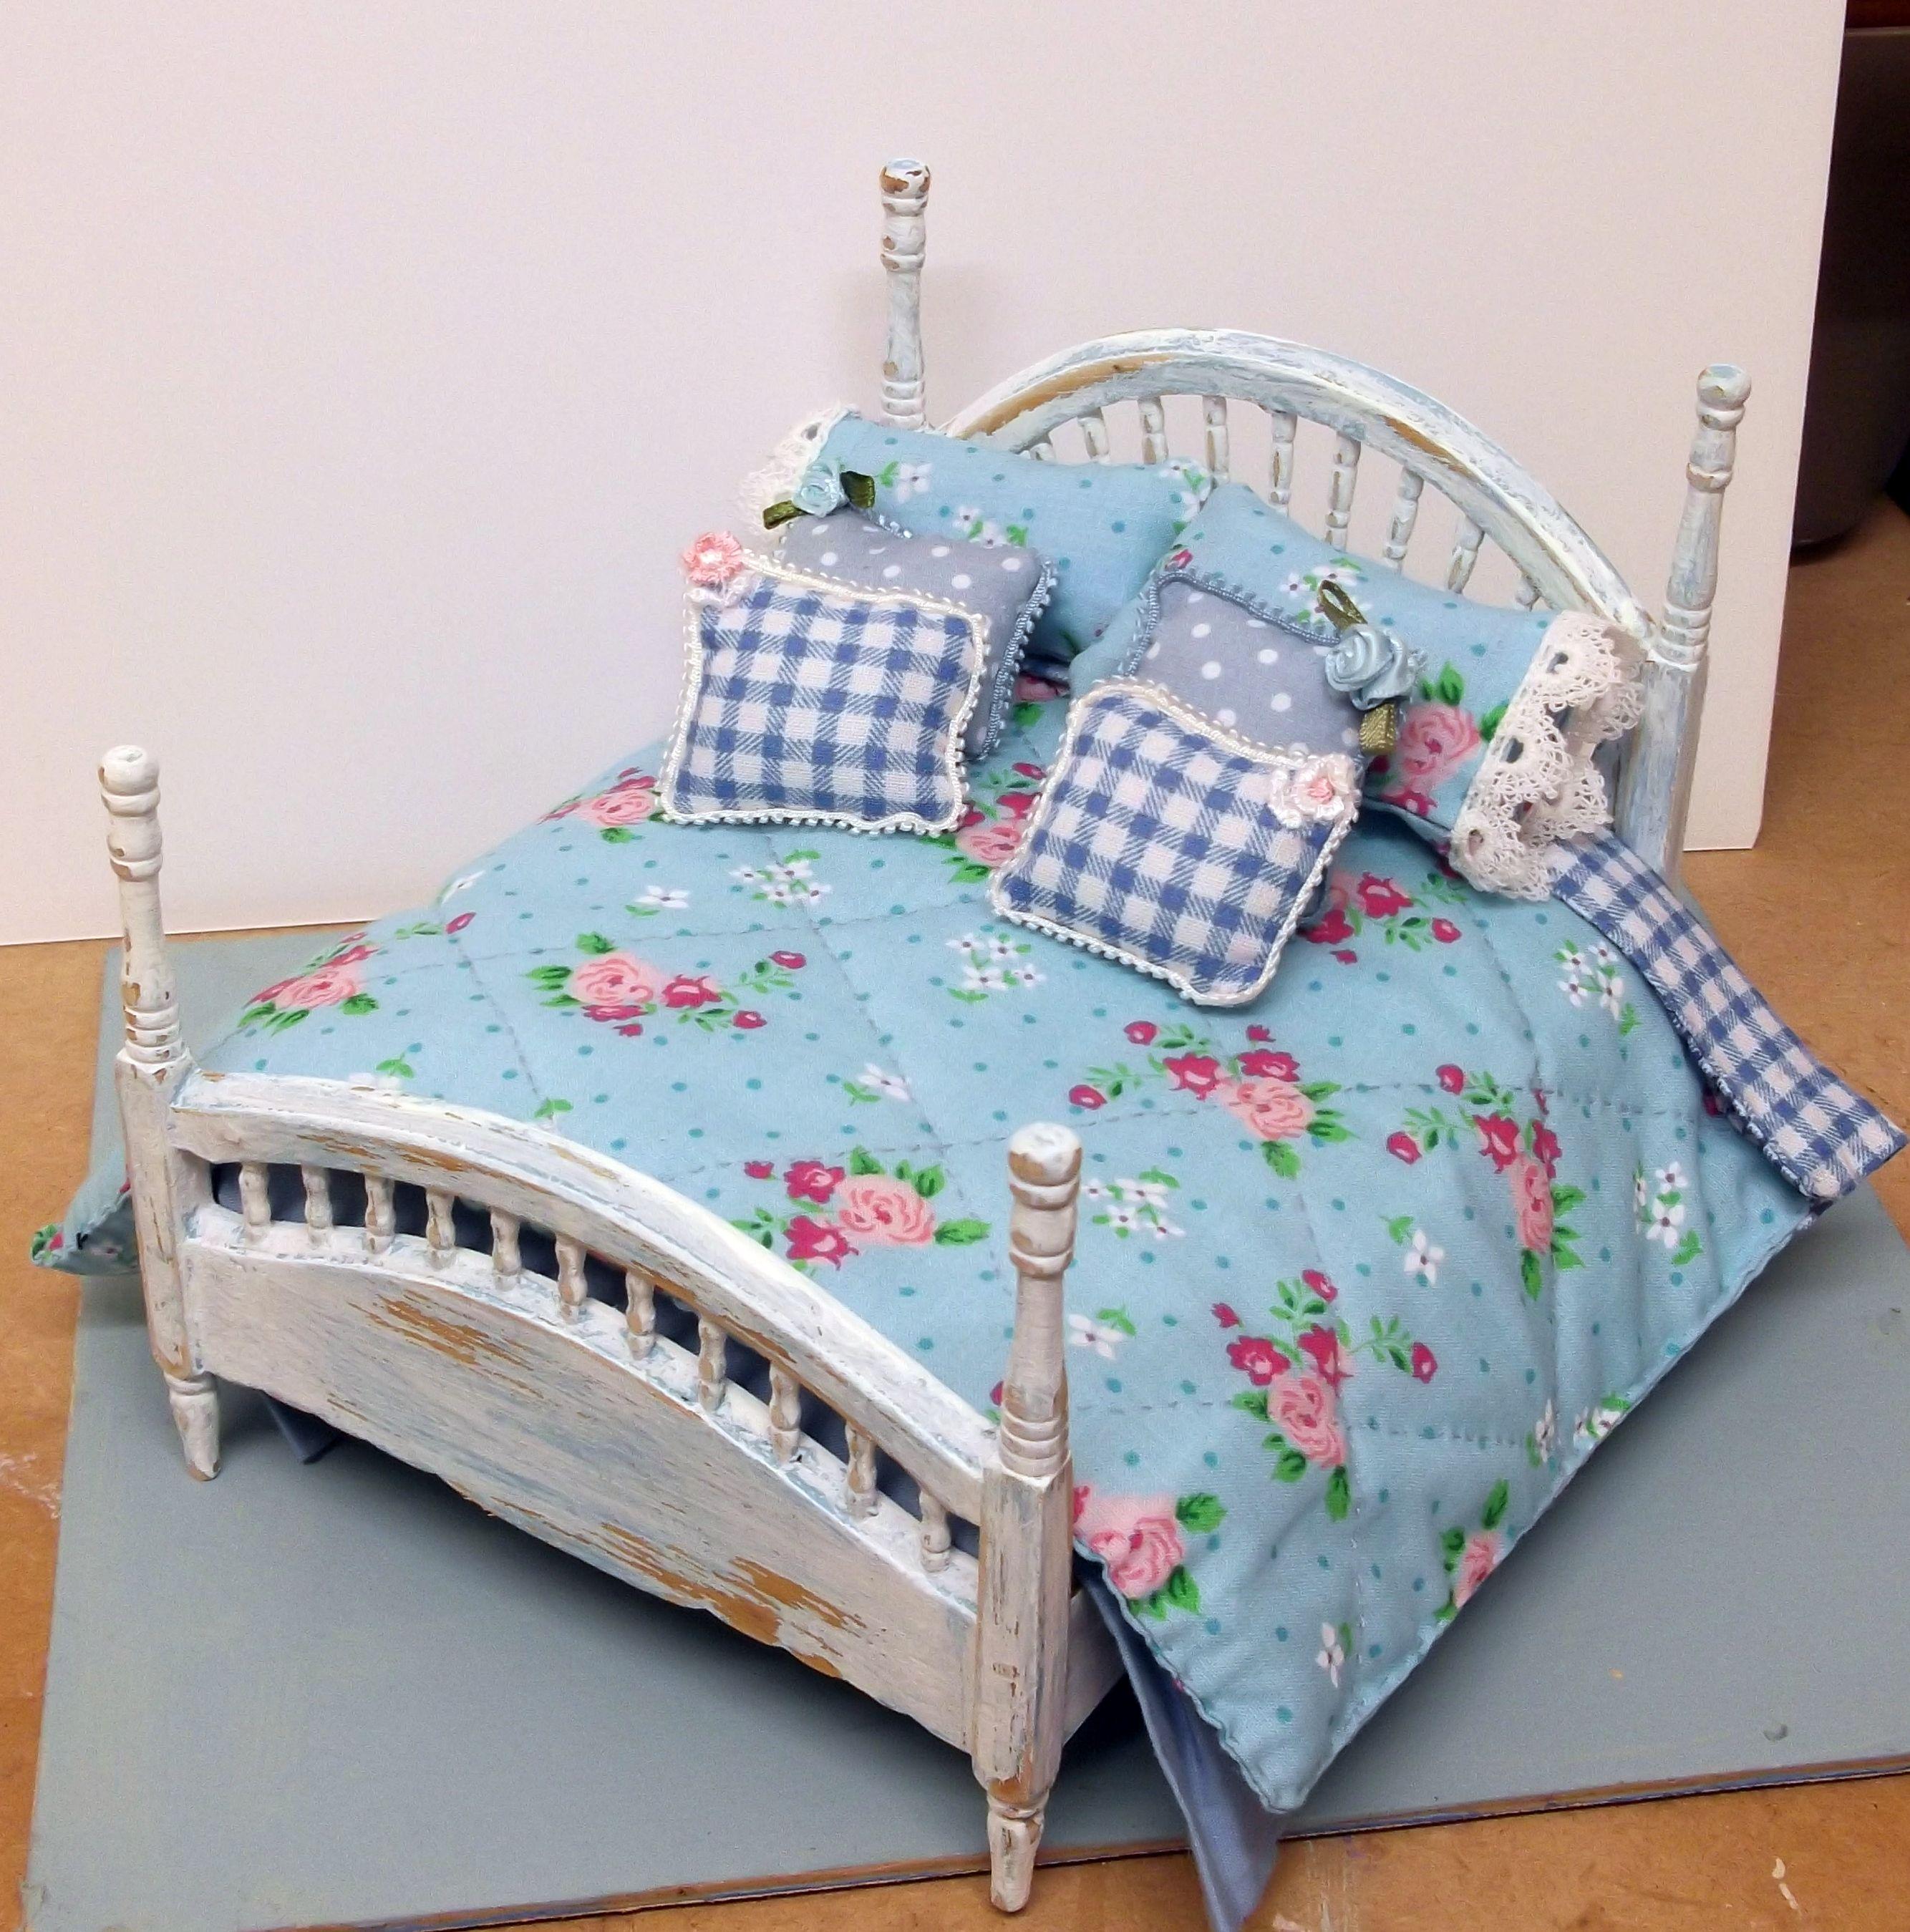 miniature shabby chic bed | miniaturasmjose | Pinterest | Miniatur ...